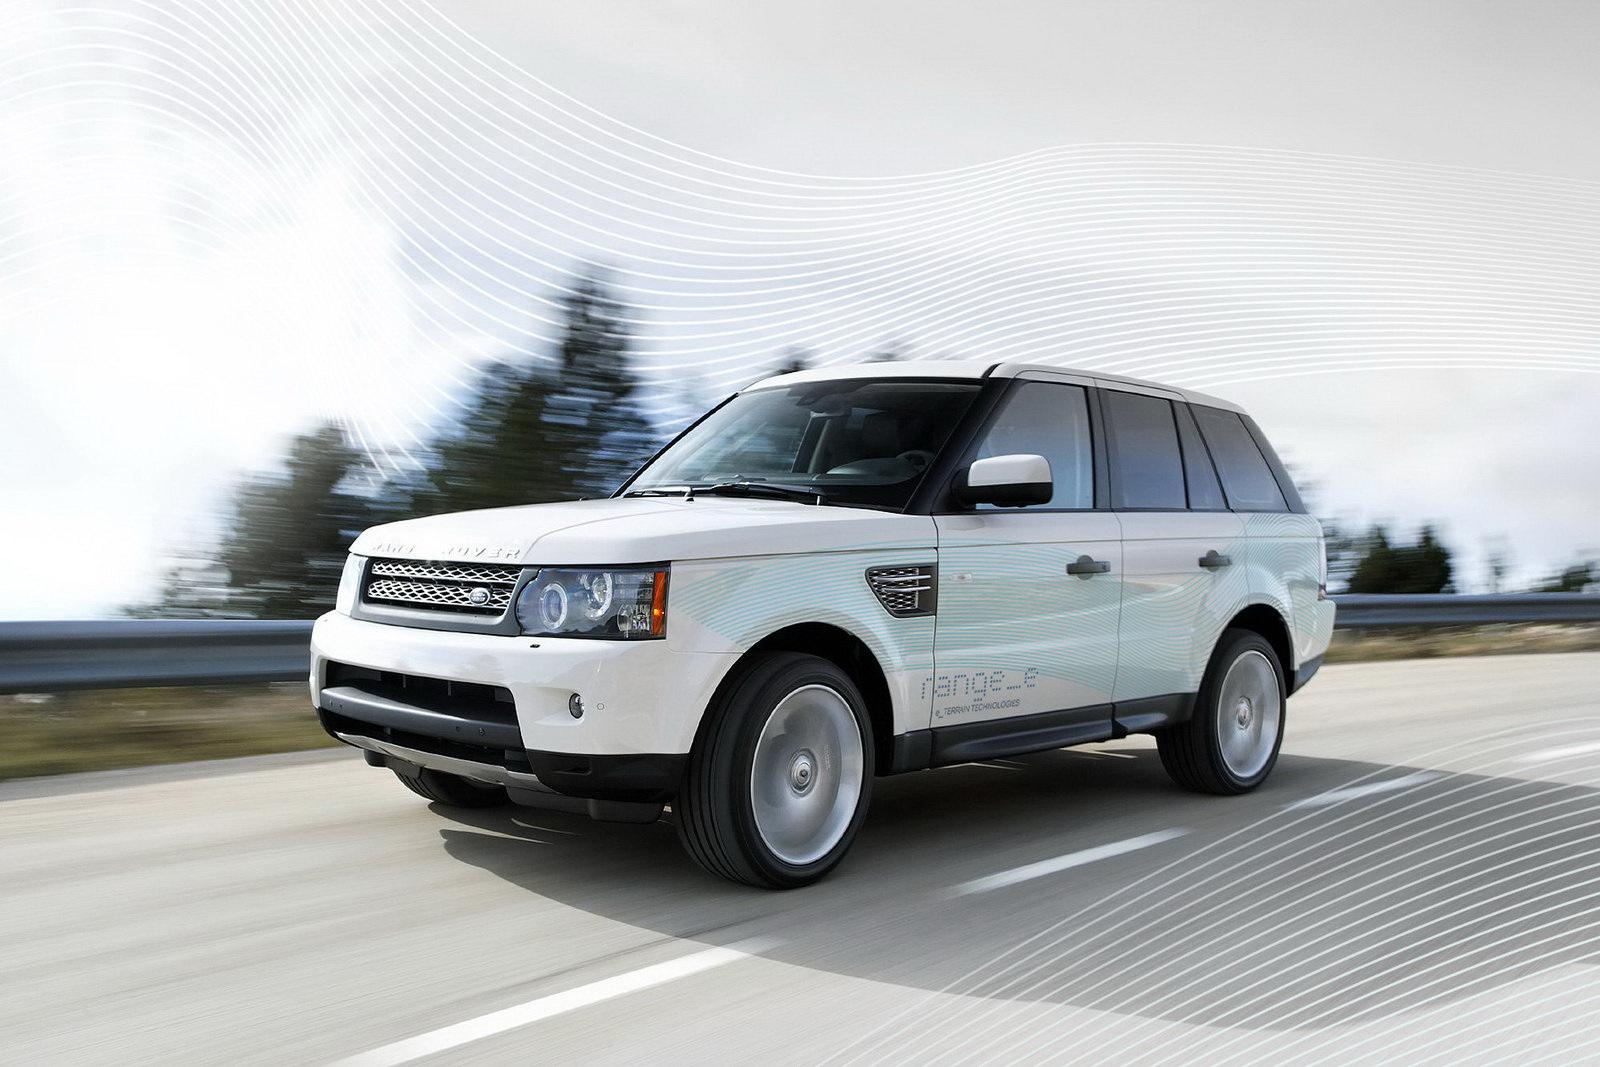 Land Rover Wallpaper #18 SantaBanta - land rover lrx concept wallpapers